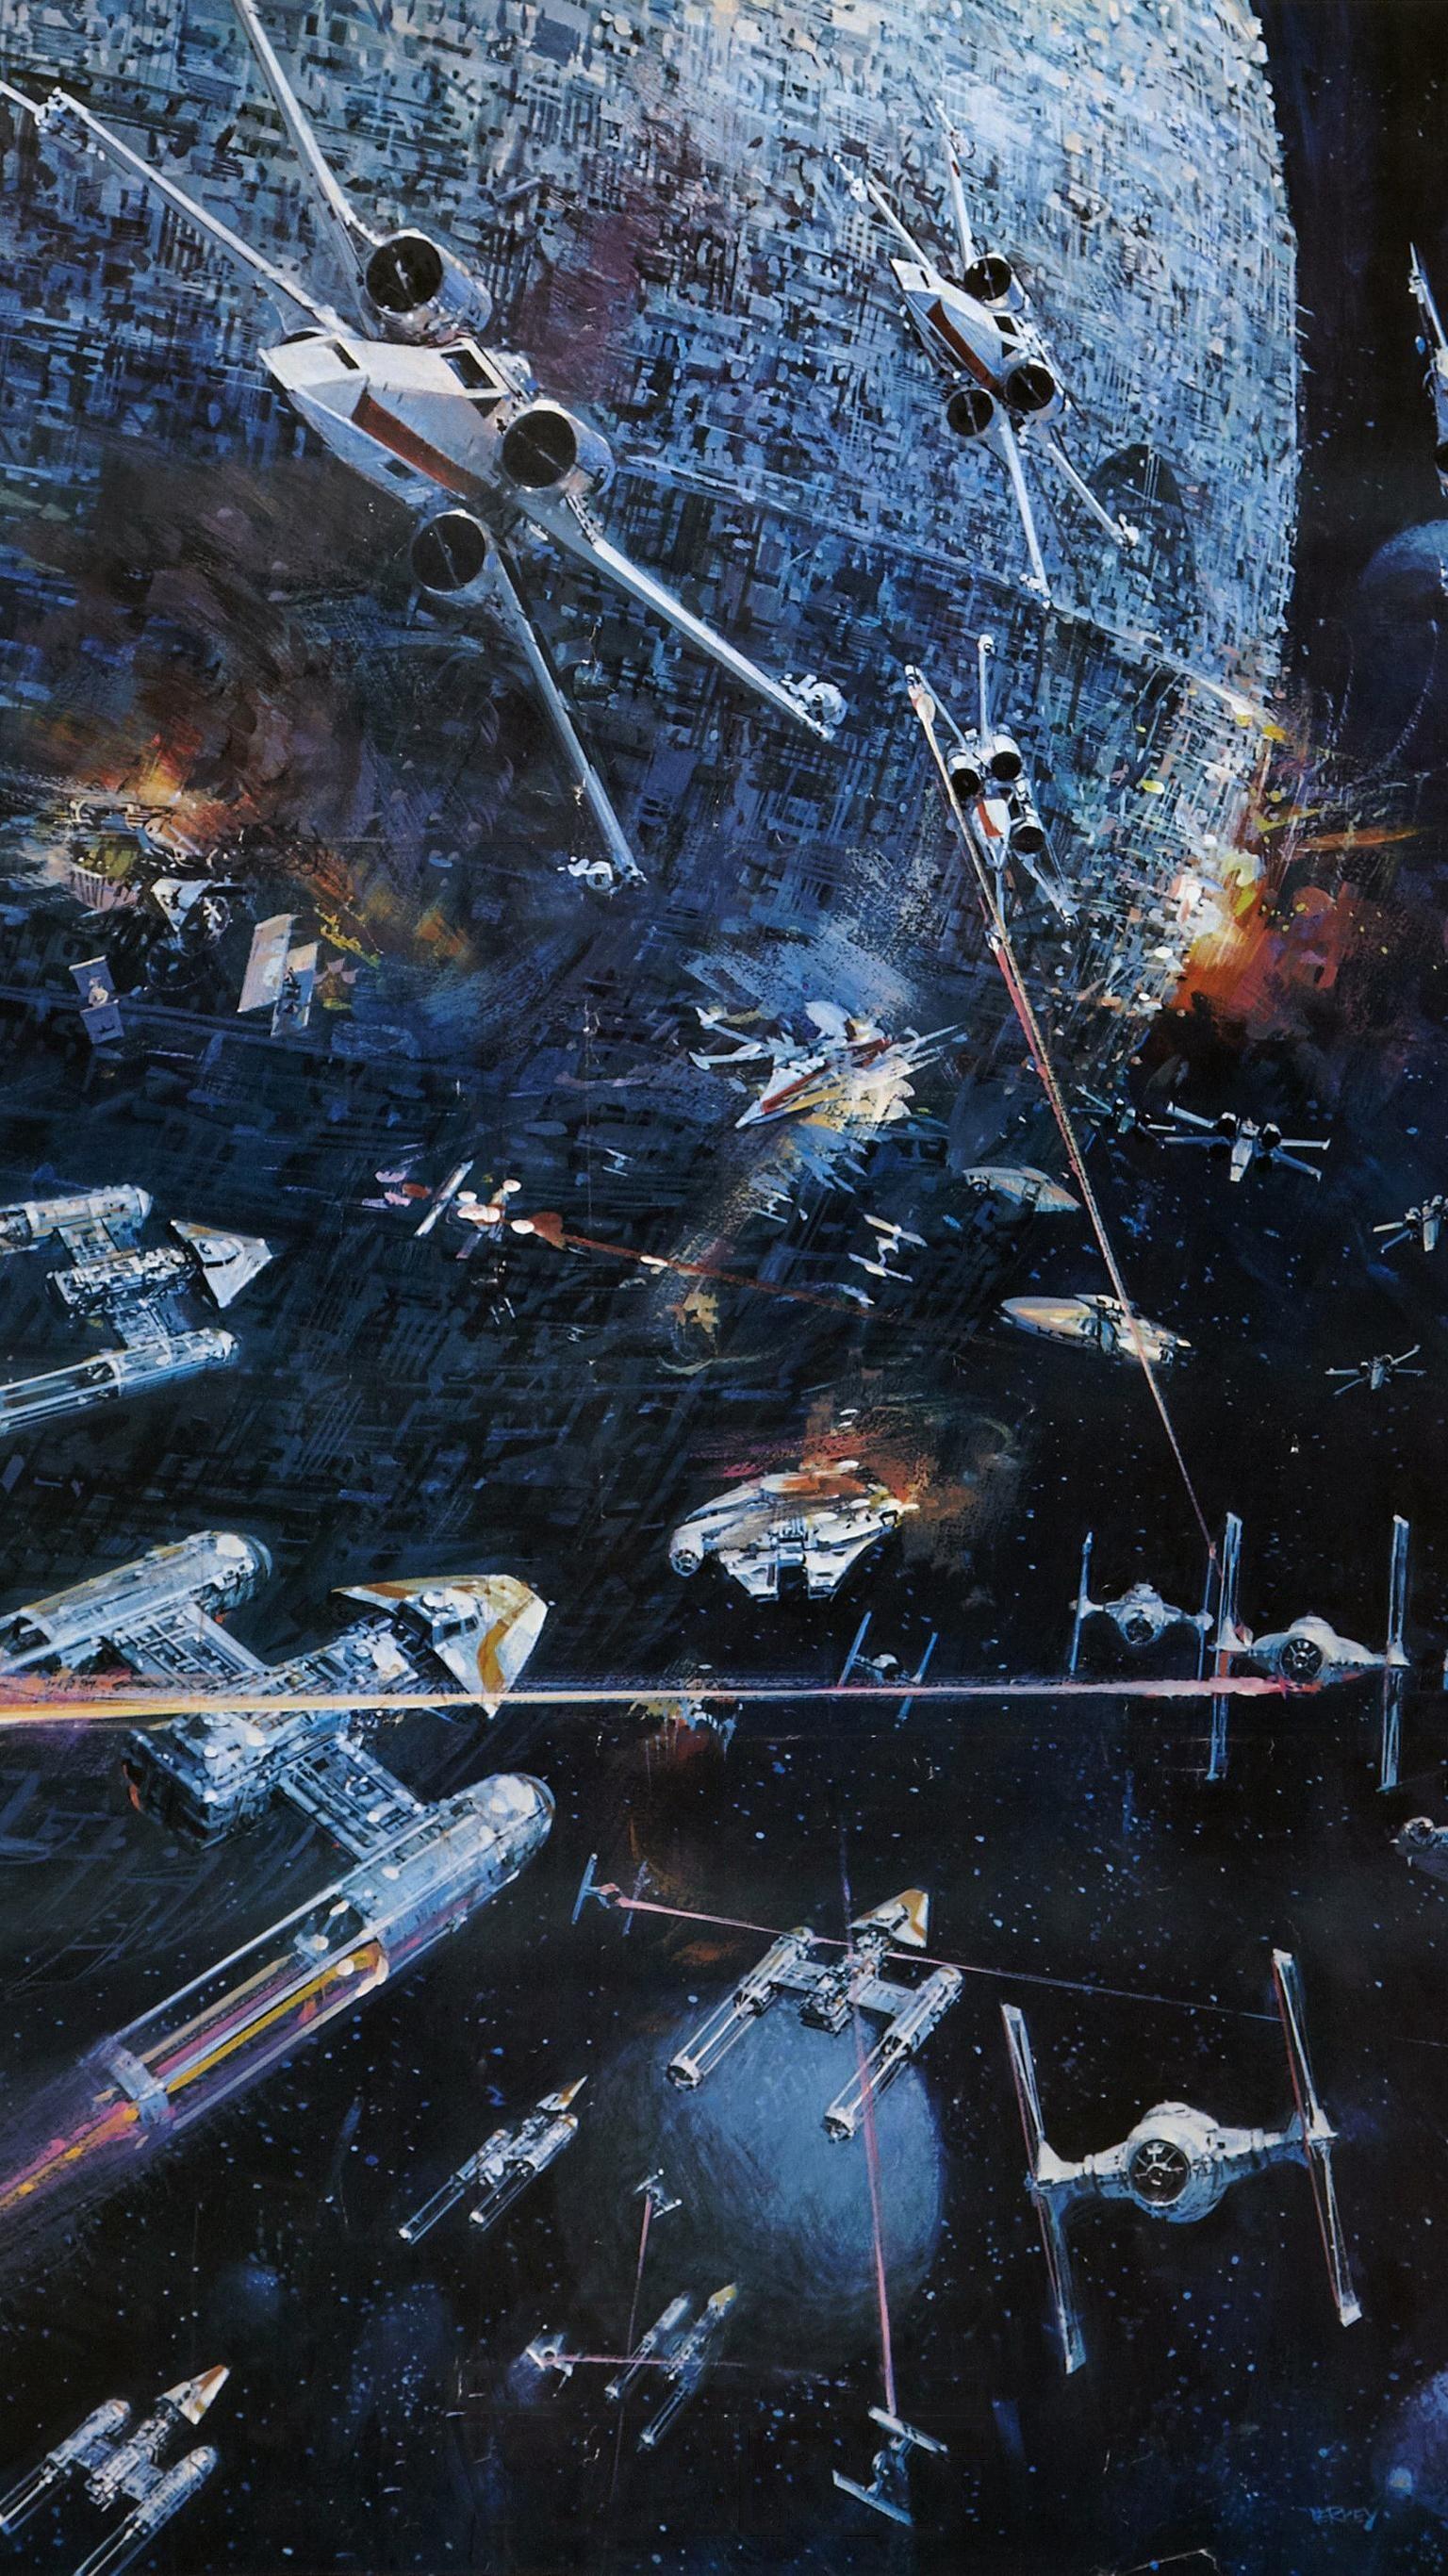 Star Wars 1977 Phone Wallpaper Star Wars Concept Art Star